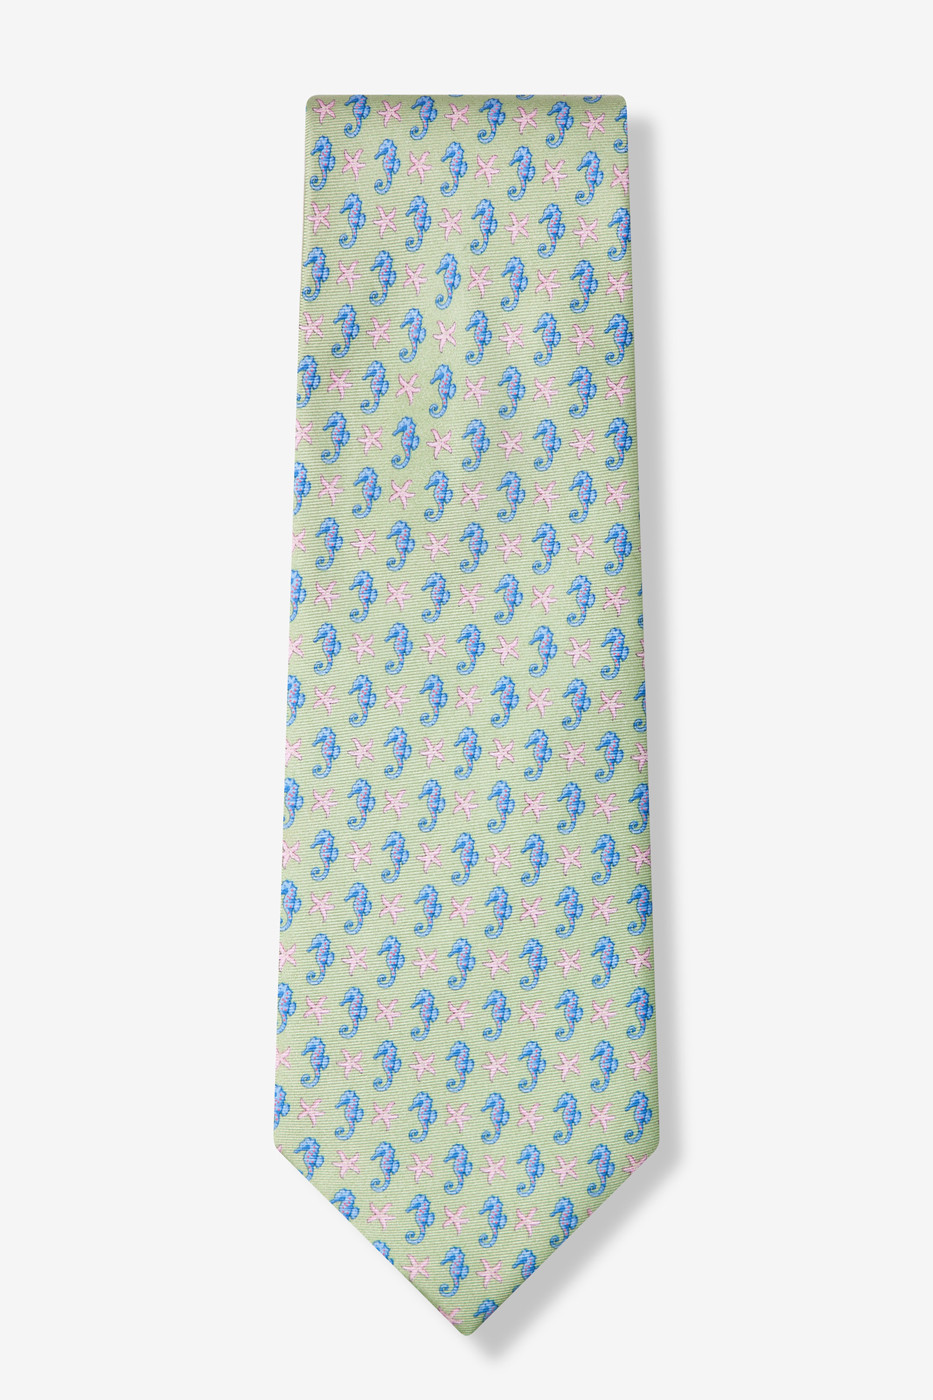 Alynn Neckwear Seahorses, Starfish Tie